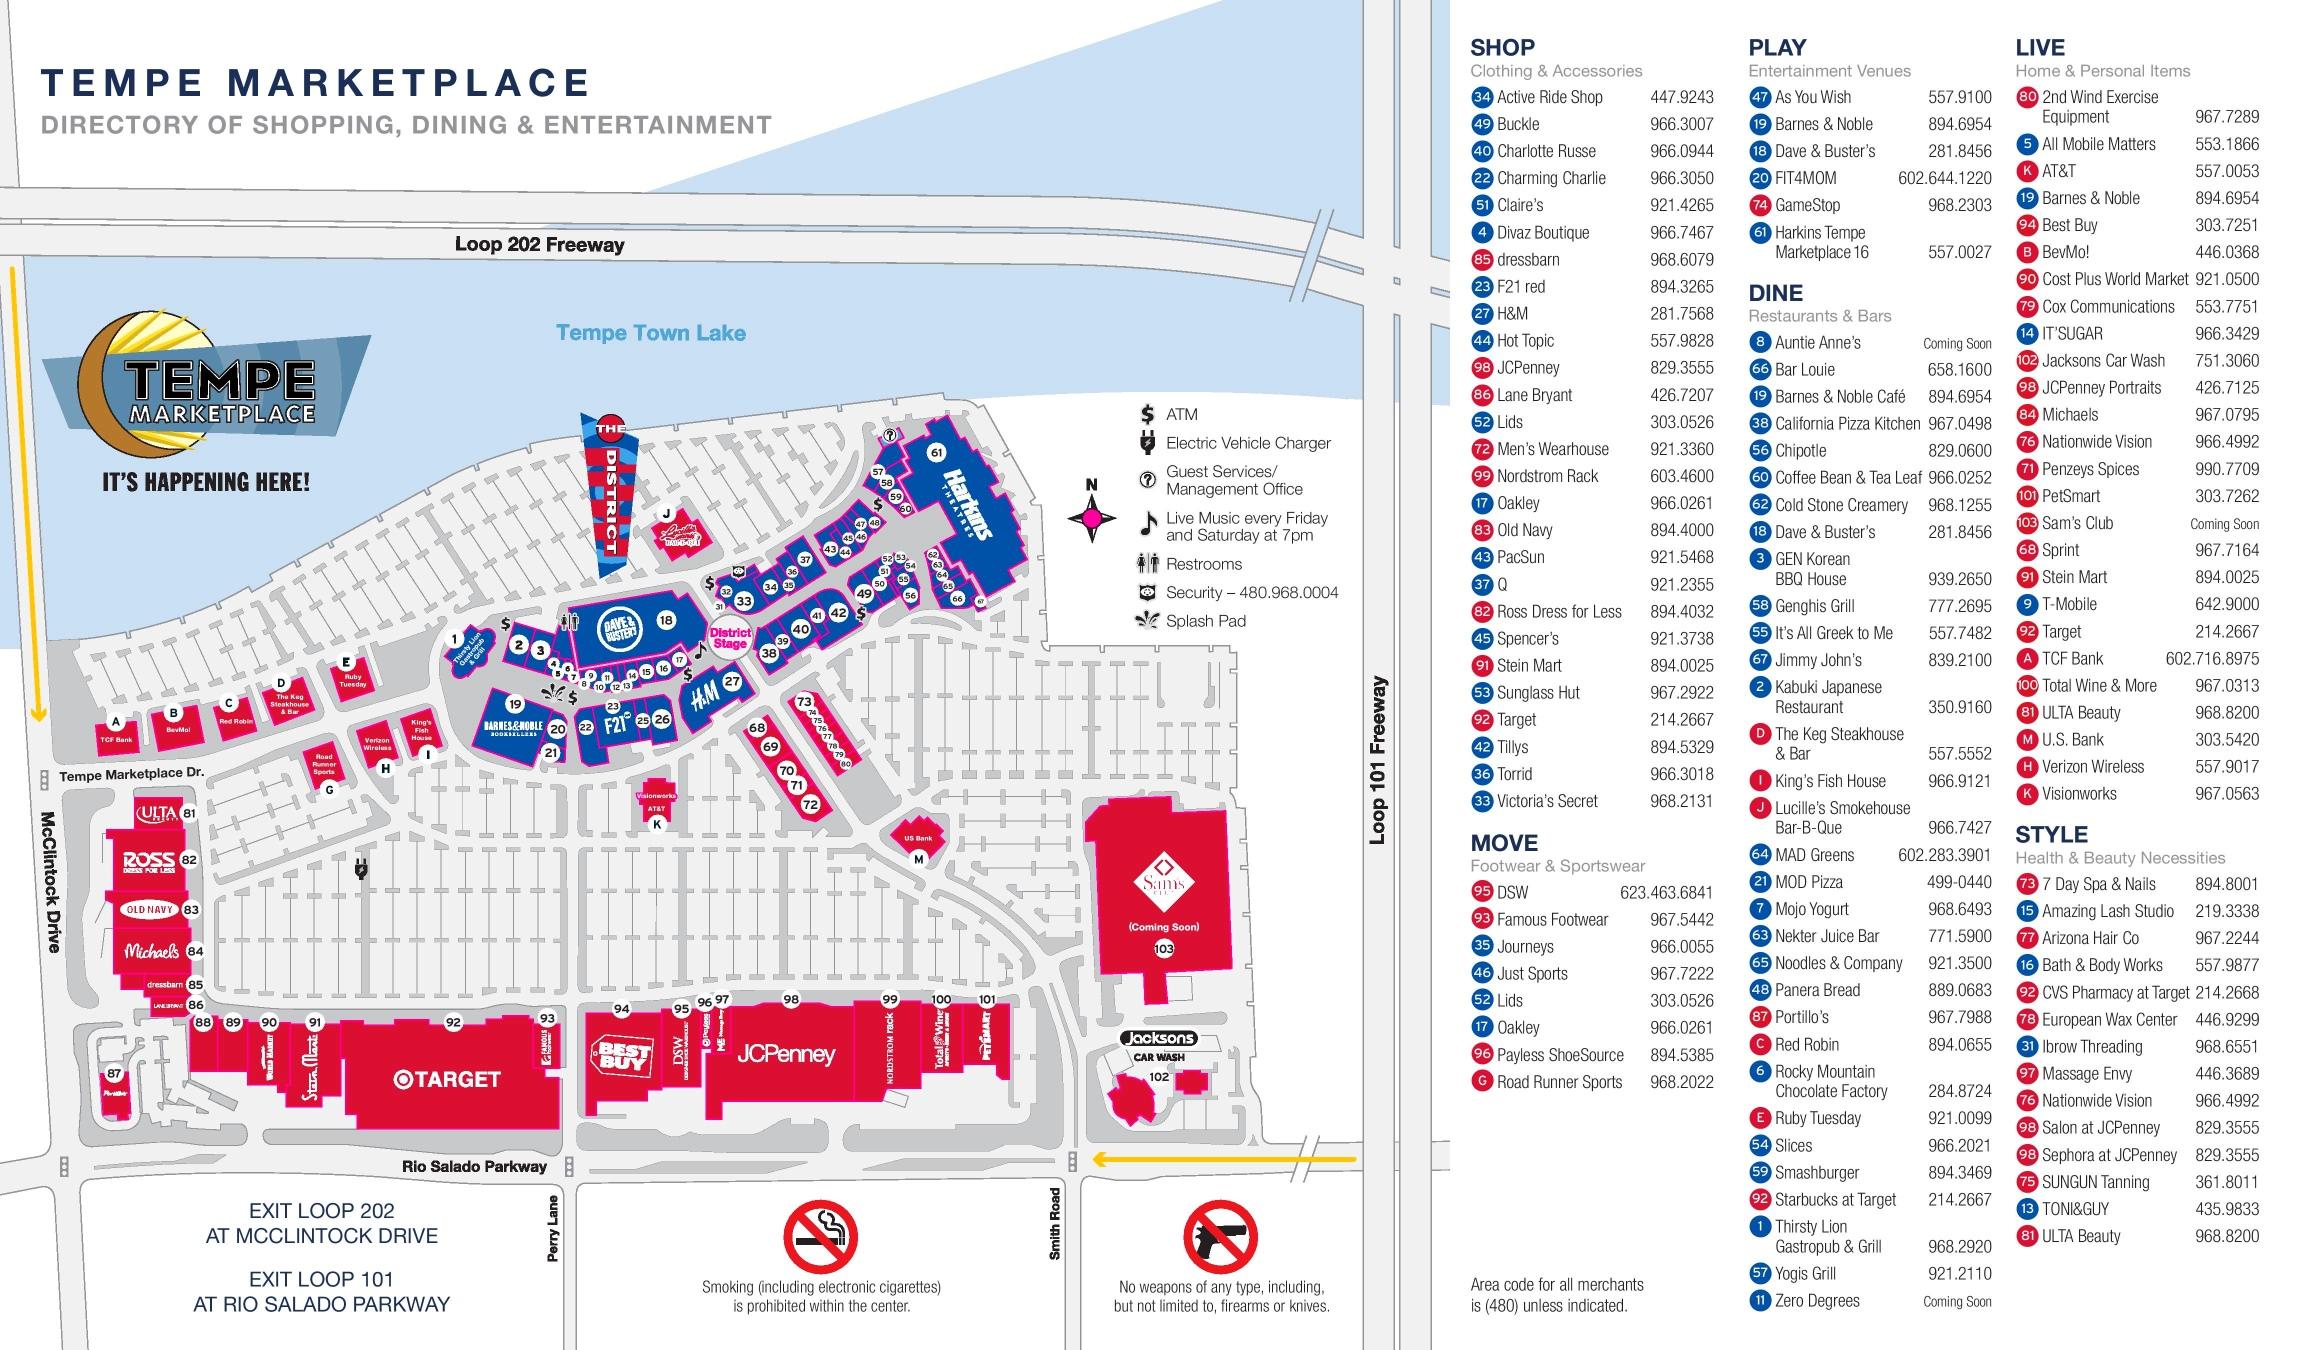 Tempe marketplace map